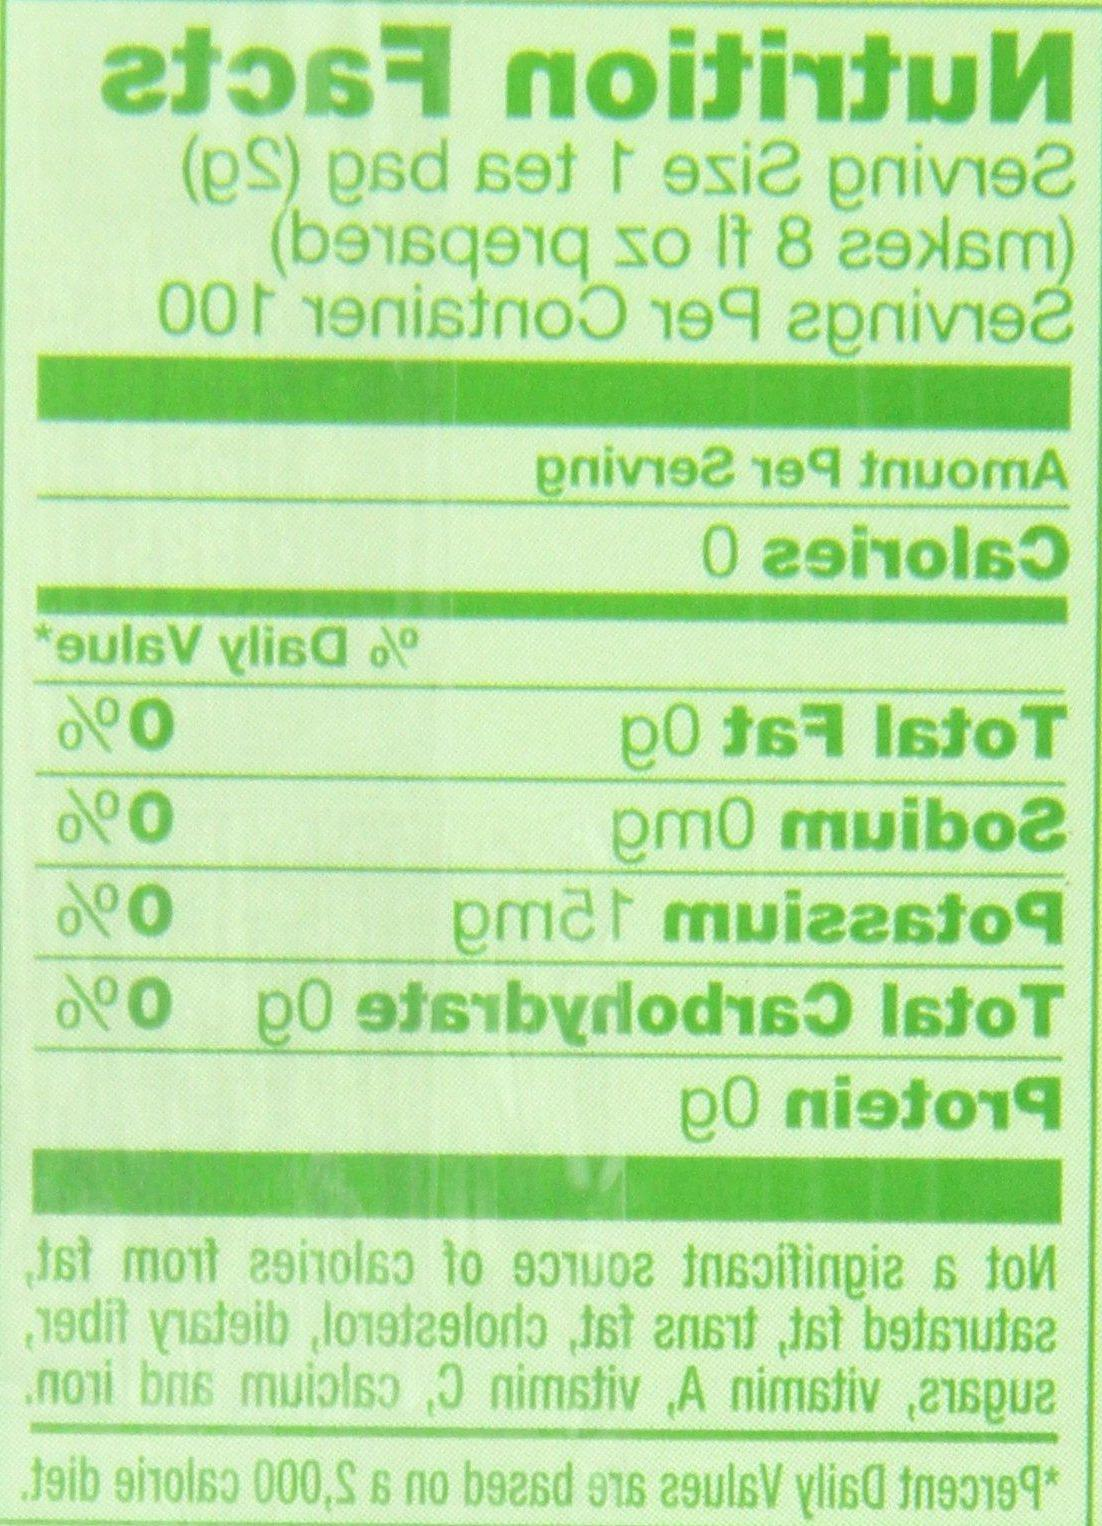 Lipton Percent ct